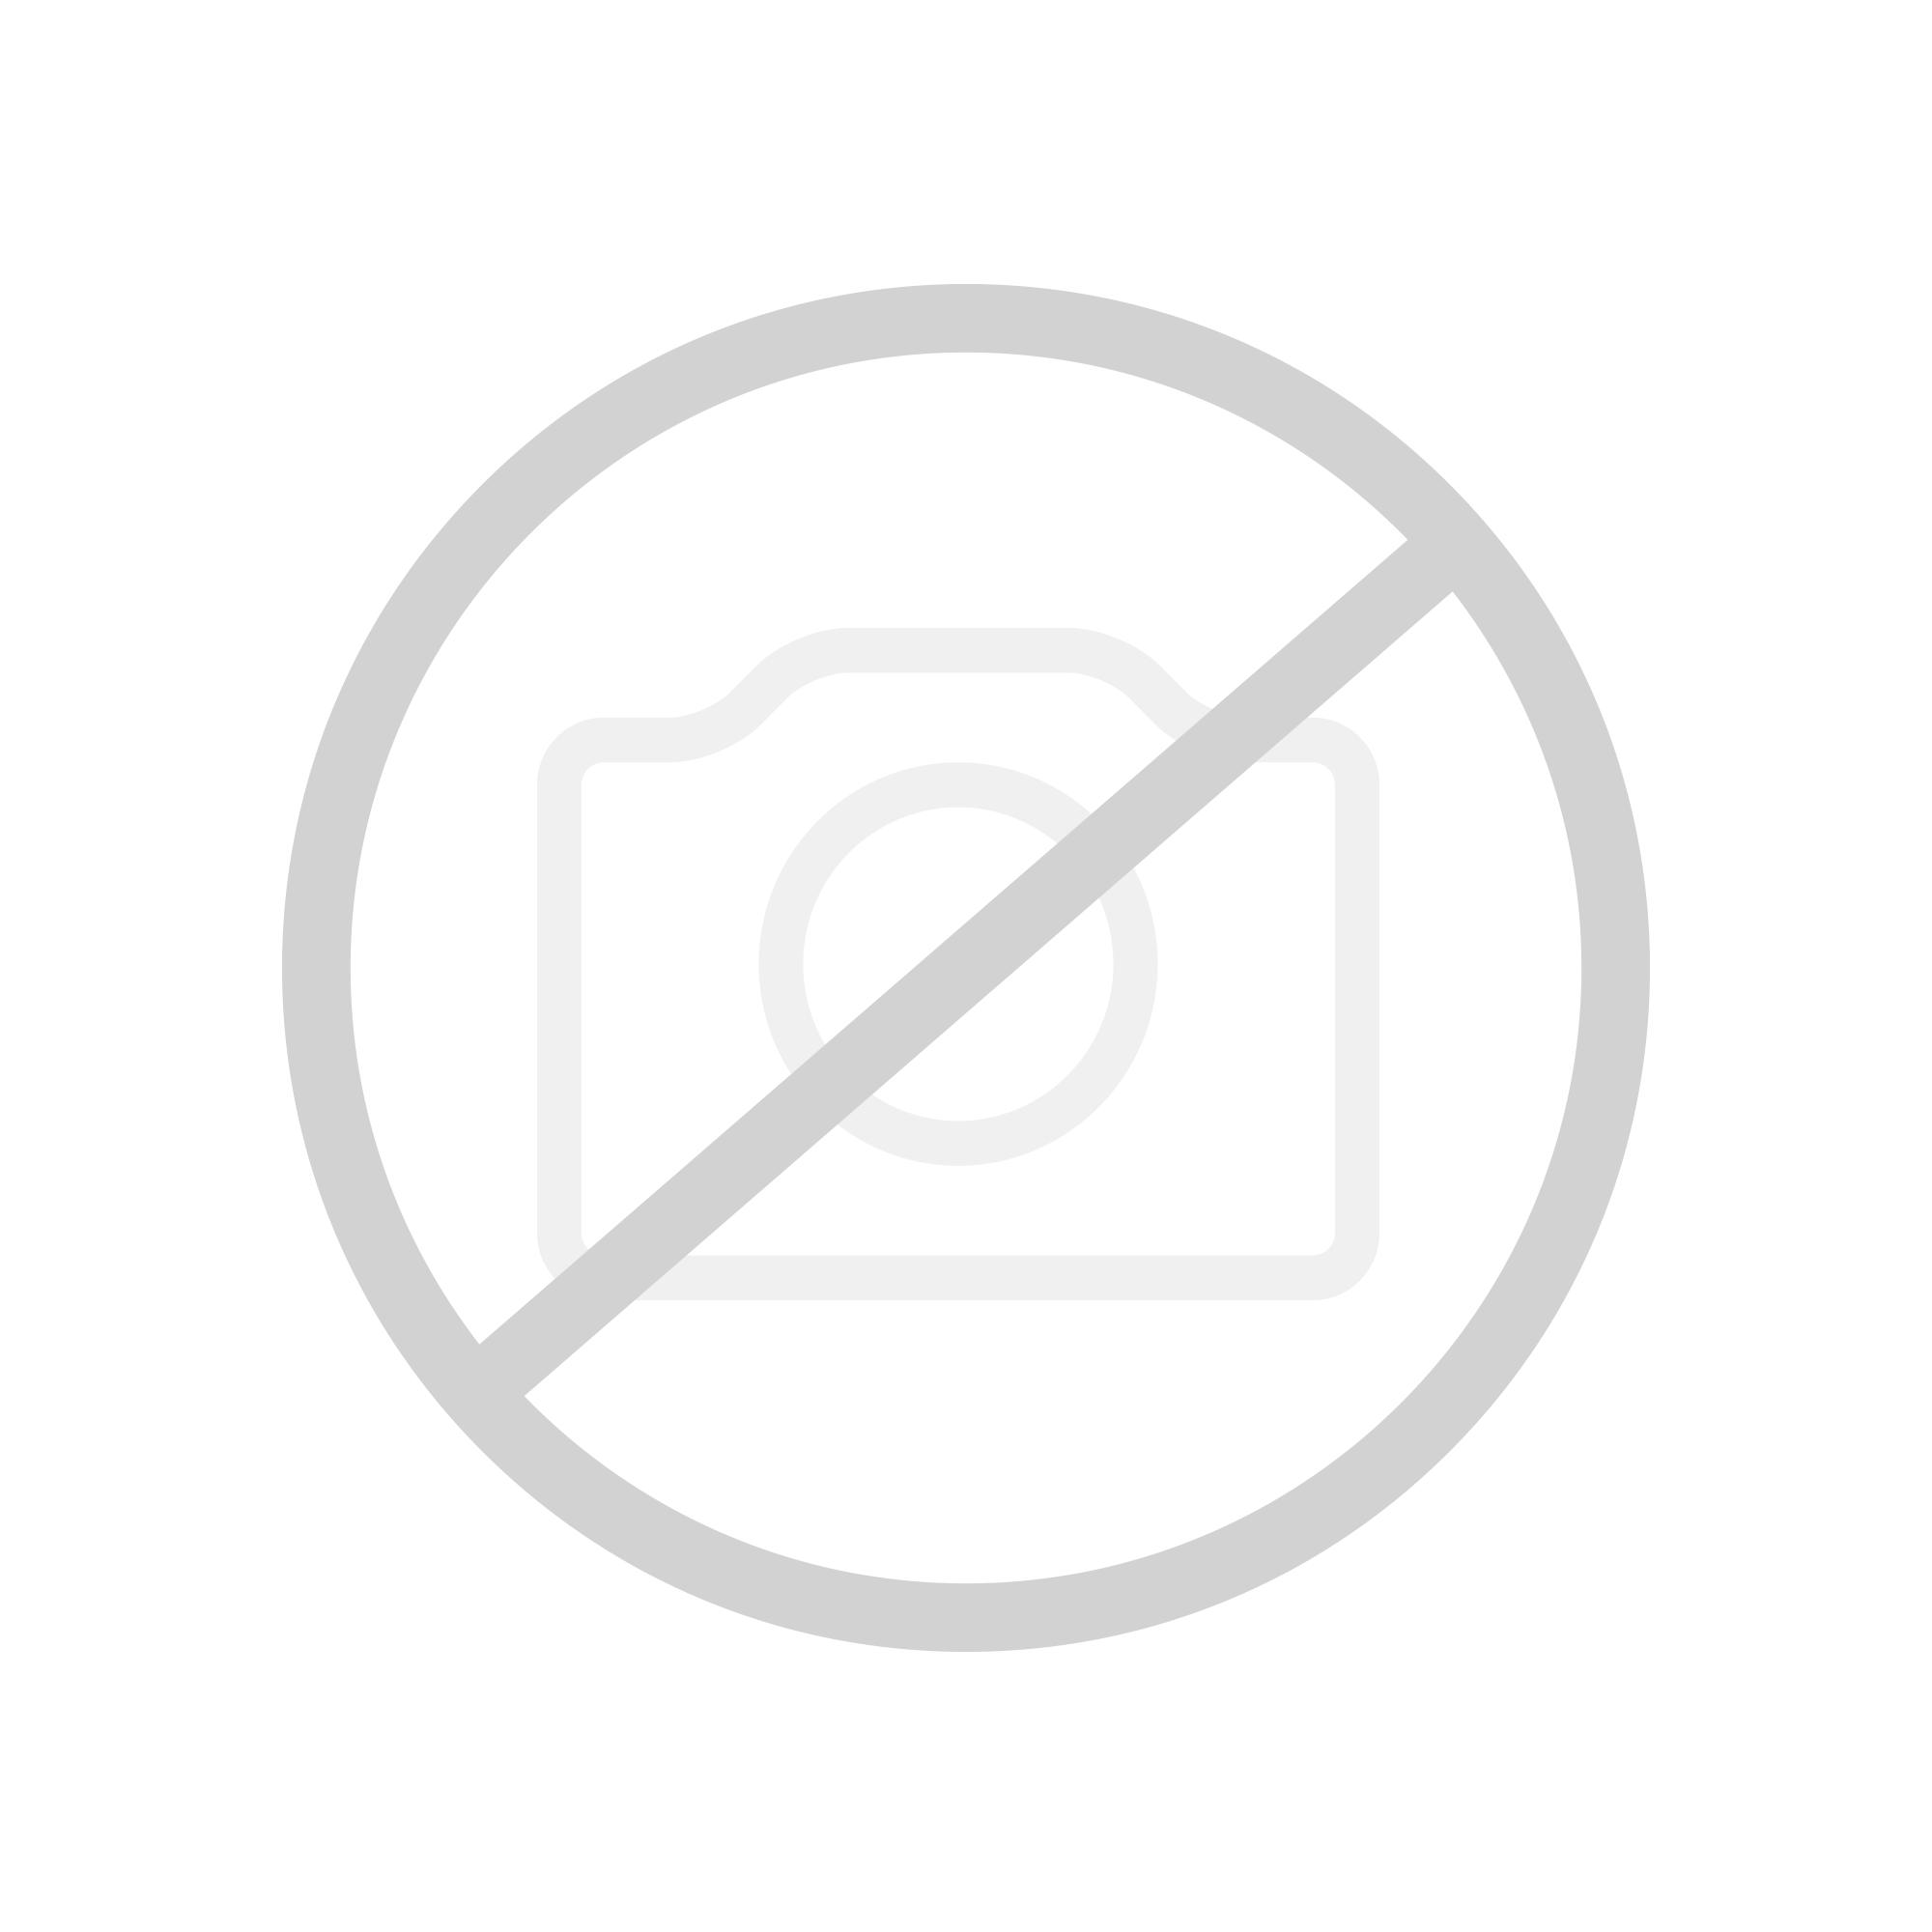 keuco edition 400 lotionspender wandmontage 11552019000 reuter. Black Bedroom Furniture Sets. Home Design Ideas